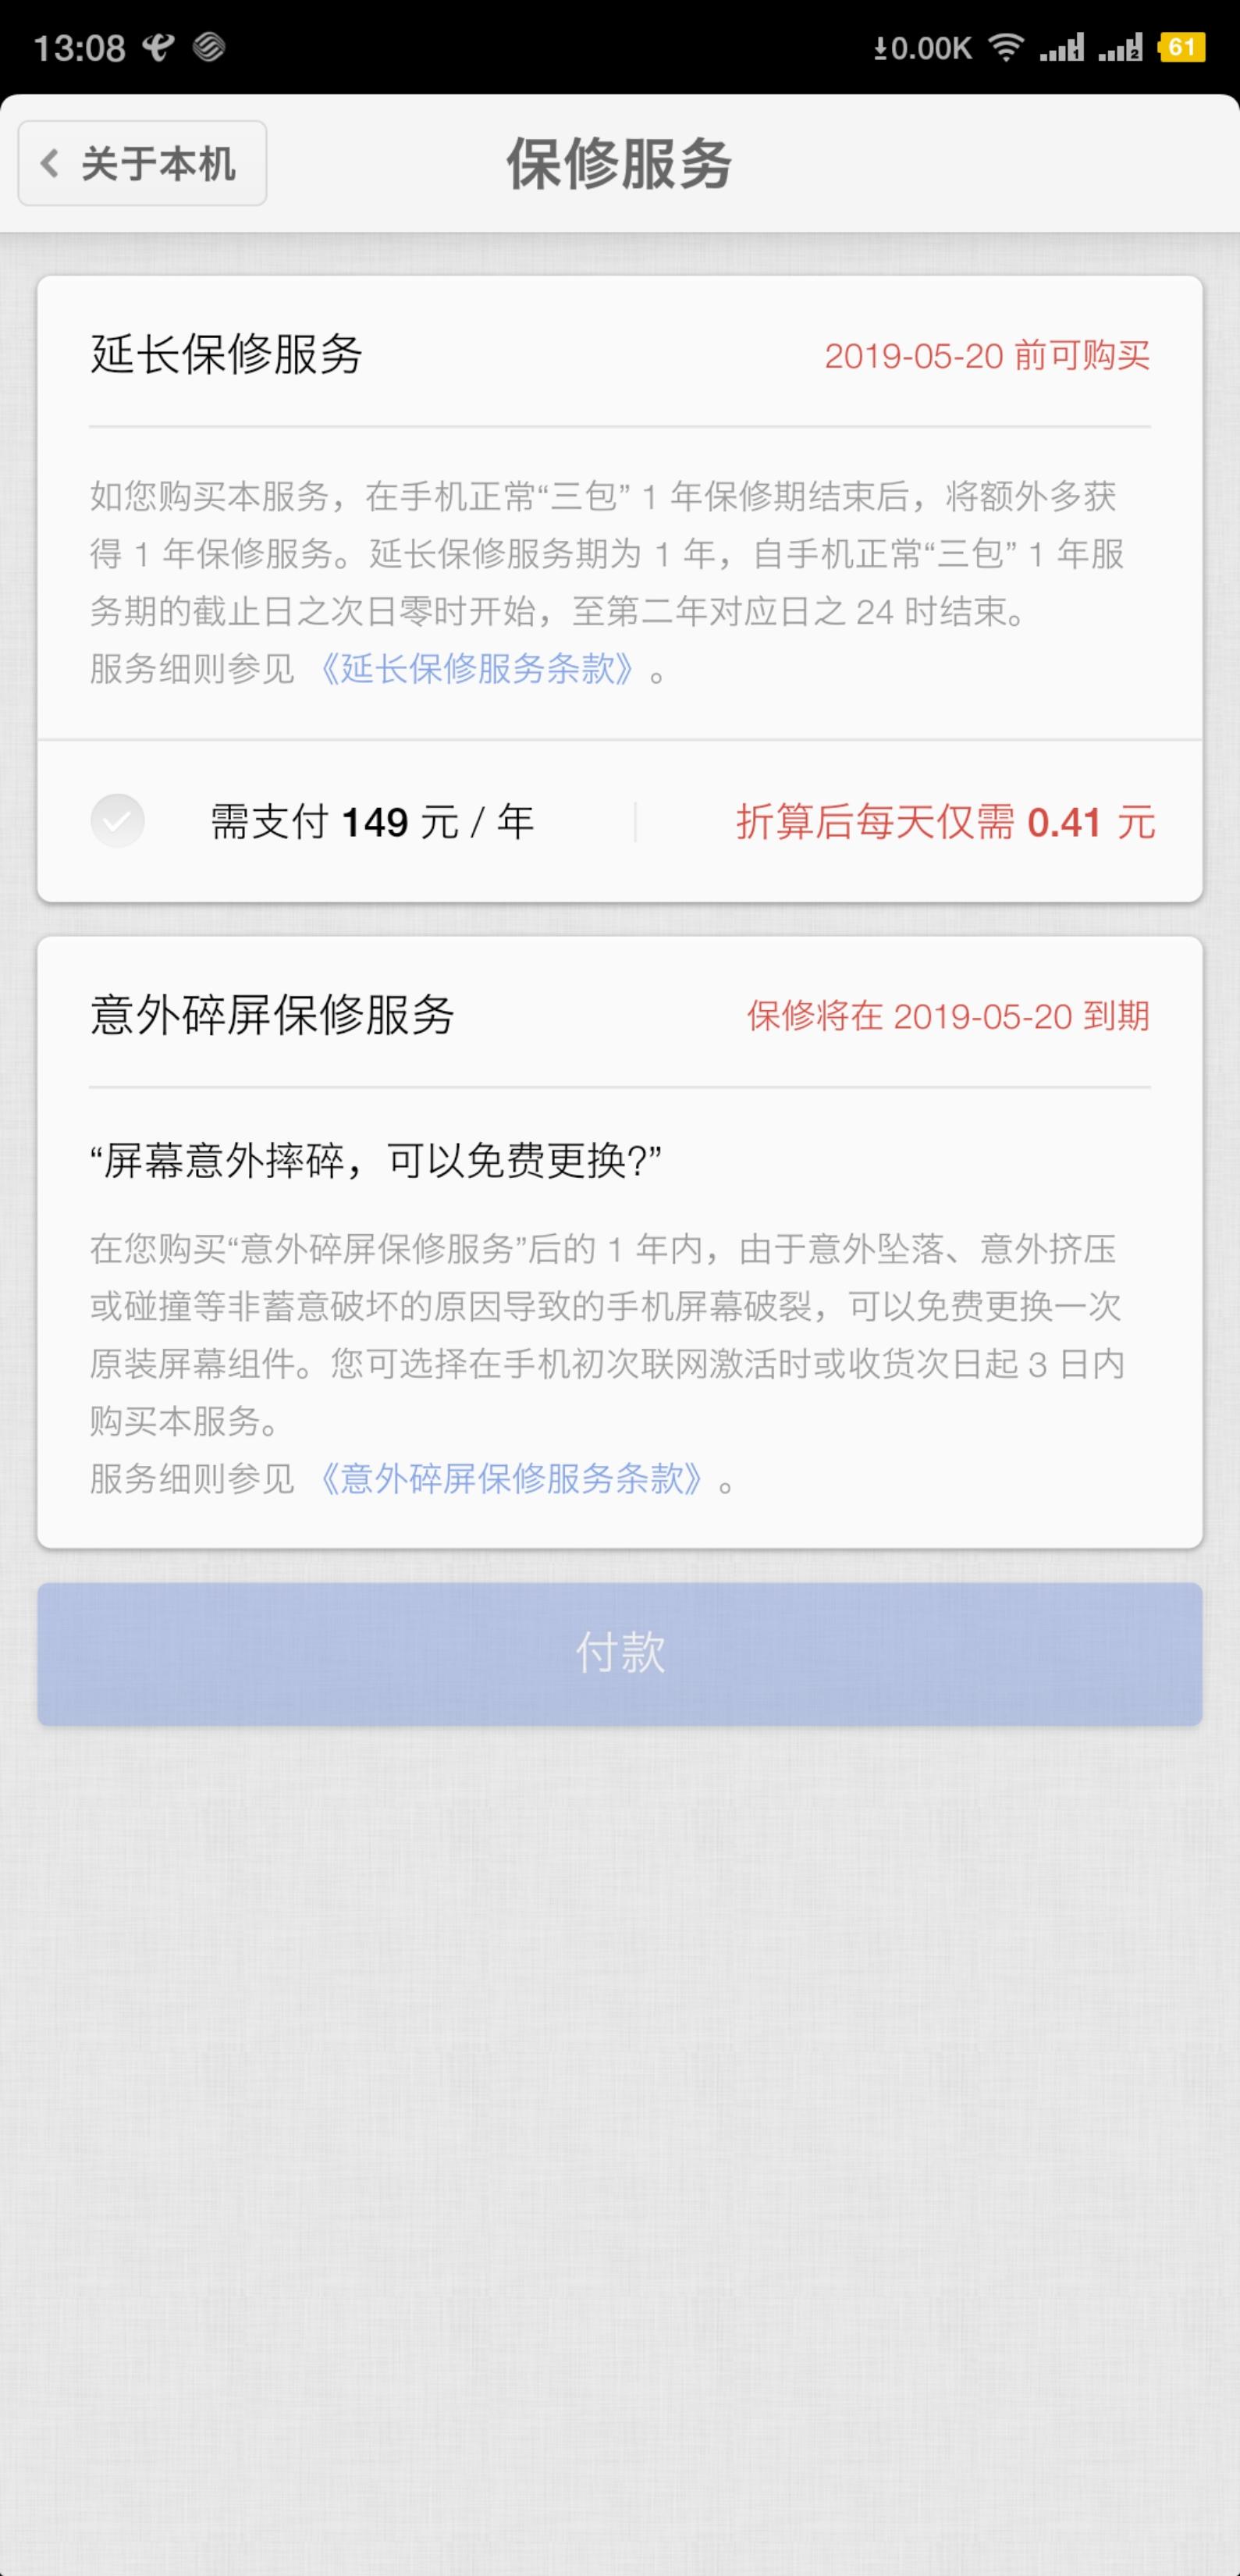 Screenshot_2019-02-10-13-08-25-468_?????.png